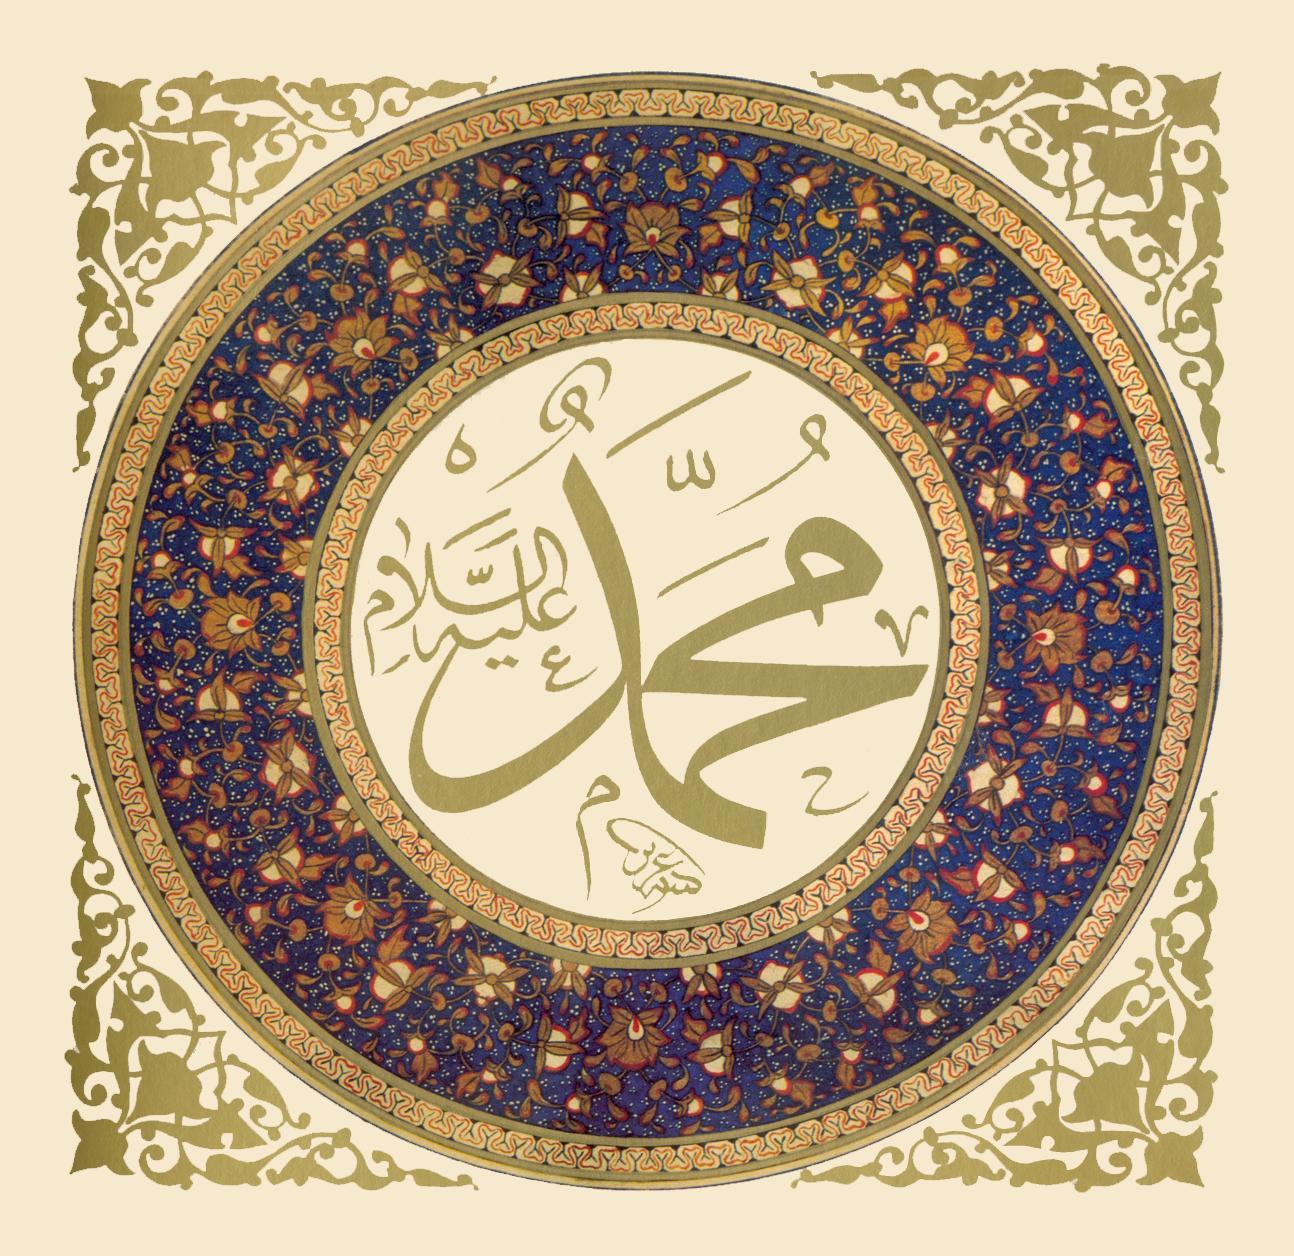 Kelahiran Nabi Muhammad Saw Nabi Muhammad Saw Lahir Pada